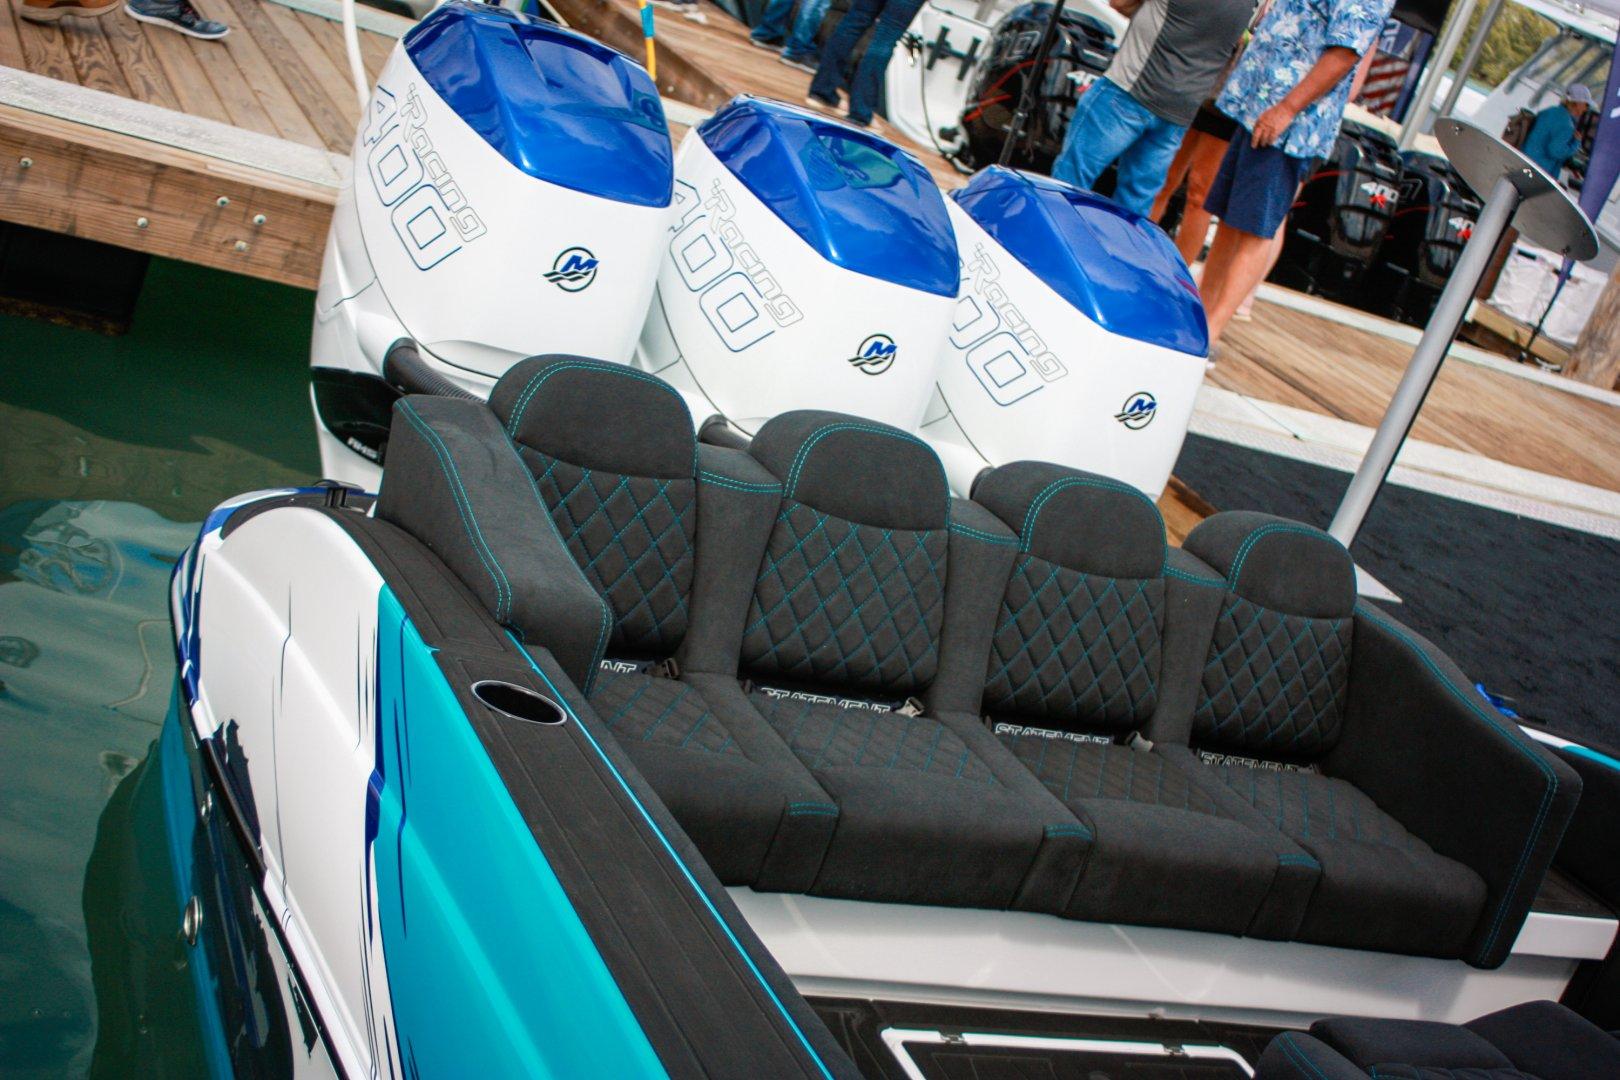 8 st 38 cc stern seating.jpg